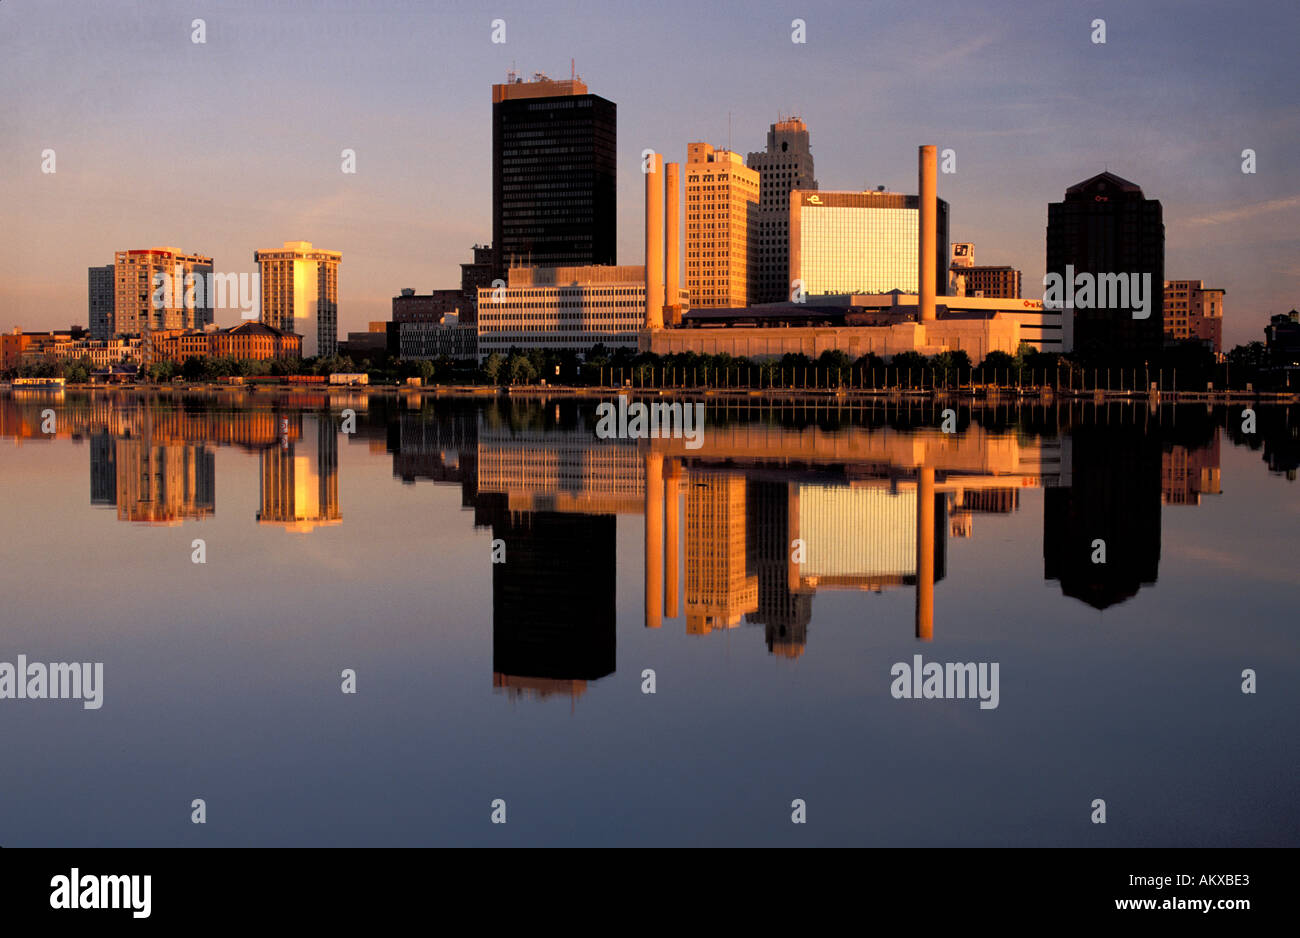 Ohio lucas county maumee - Skyline Of Toledo Ohio At Sunrise Maumee River Stock Image